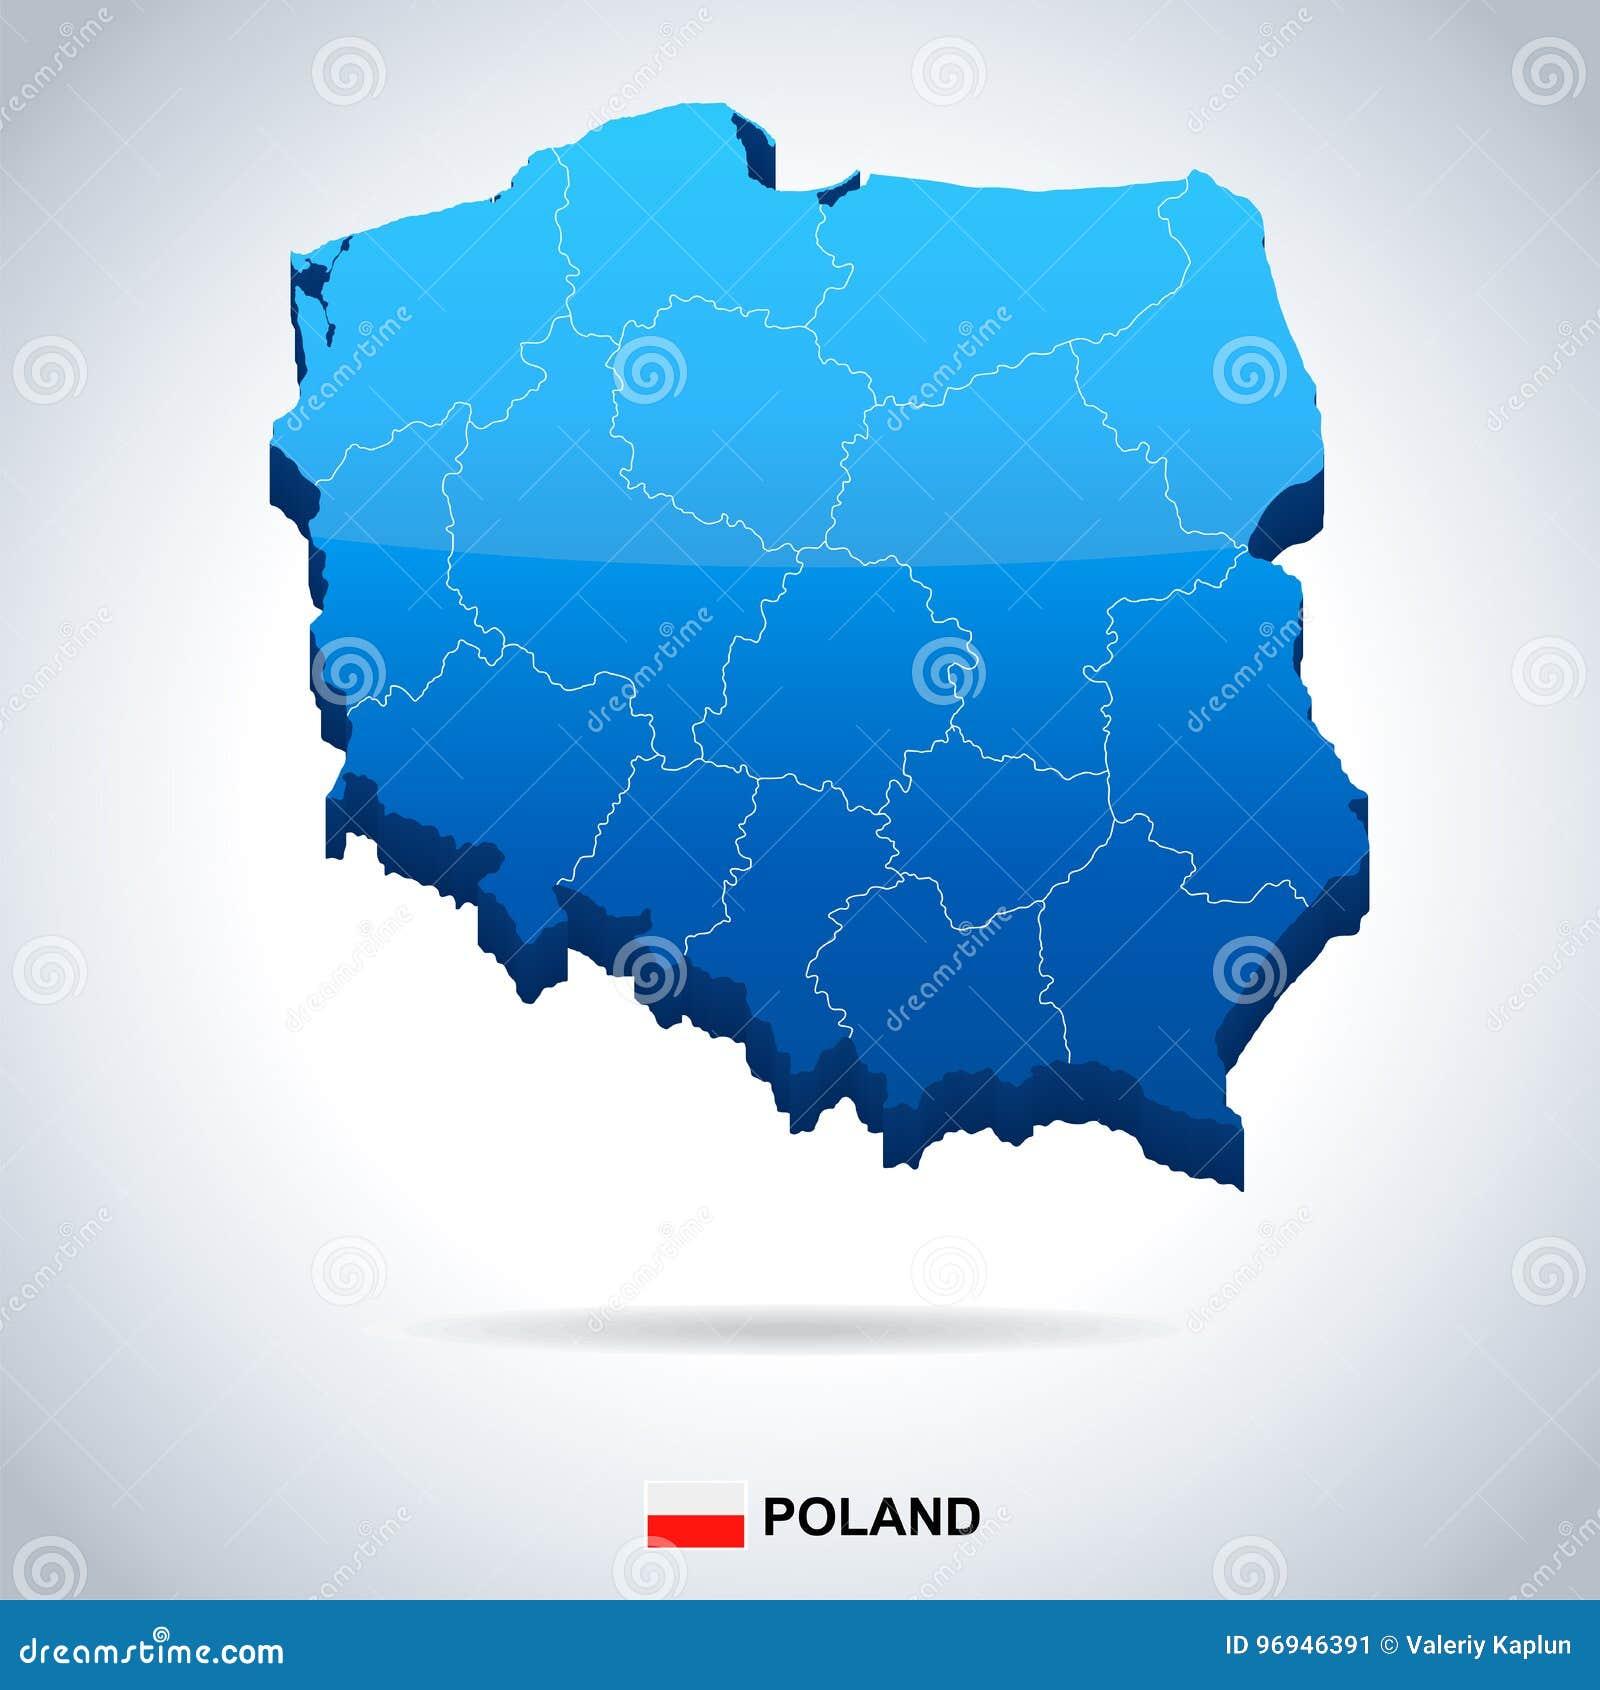 Poland - Map And Flag Illustration Stock Illustration - Illustration ...